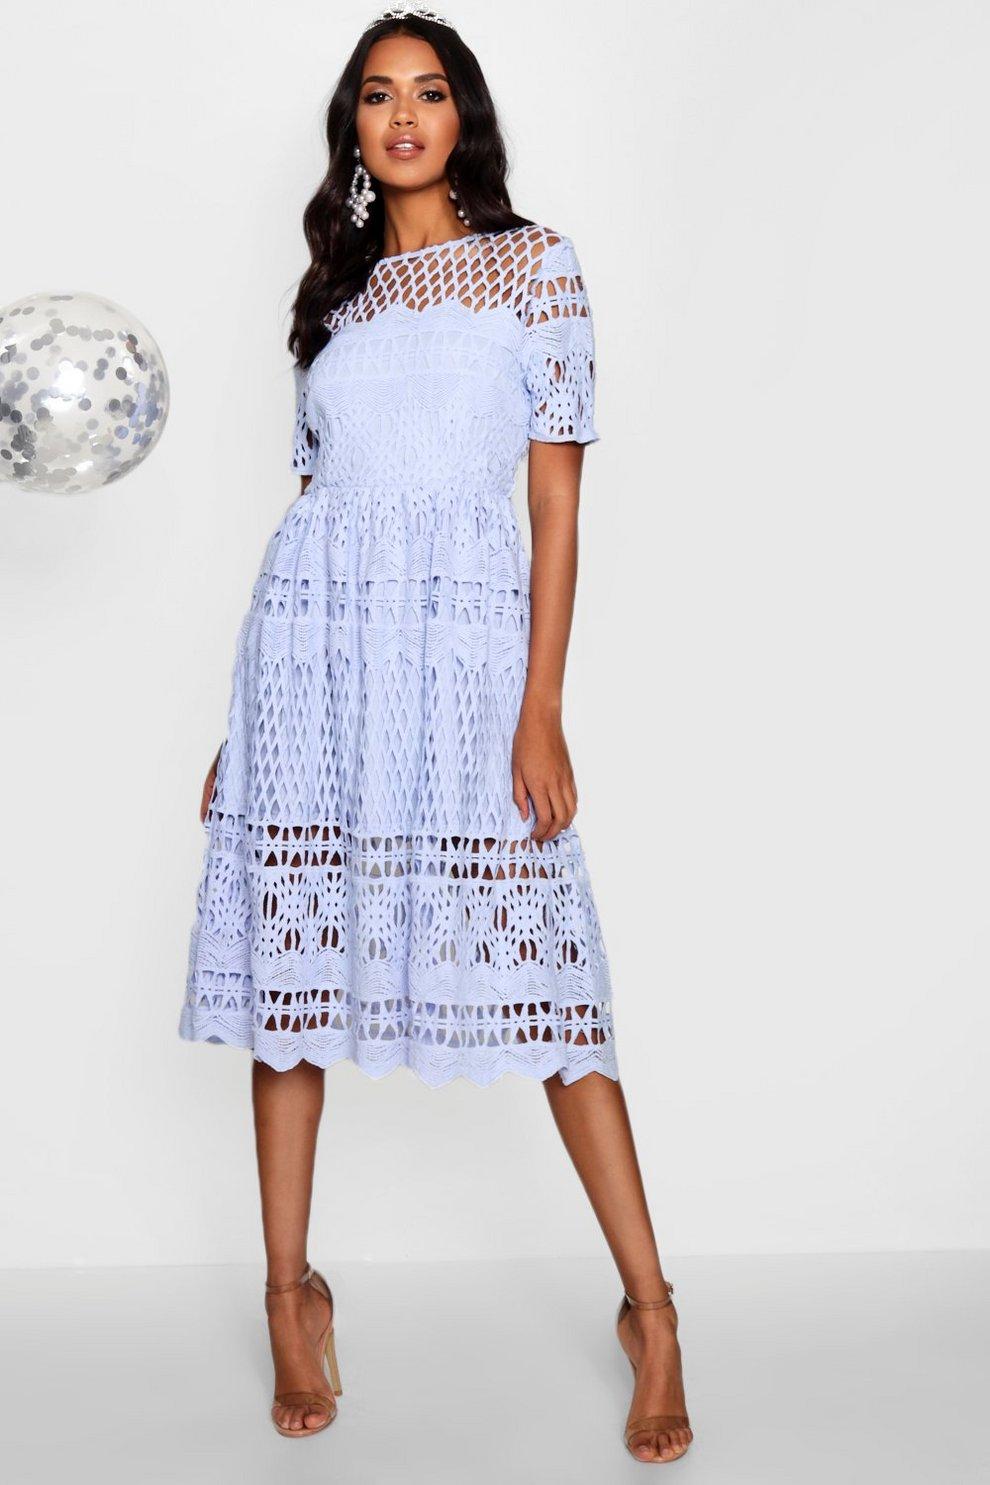 662edff11f Boutique Li Panelled Full Skirt Skater Dress -  quality design fa7c5 ef5d5  Boutique Corded Lace Panelled Skater Dress ...